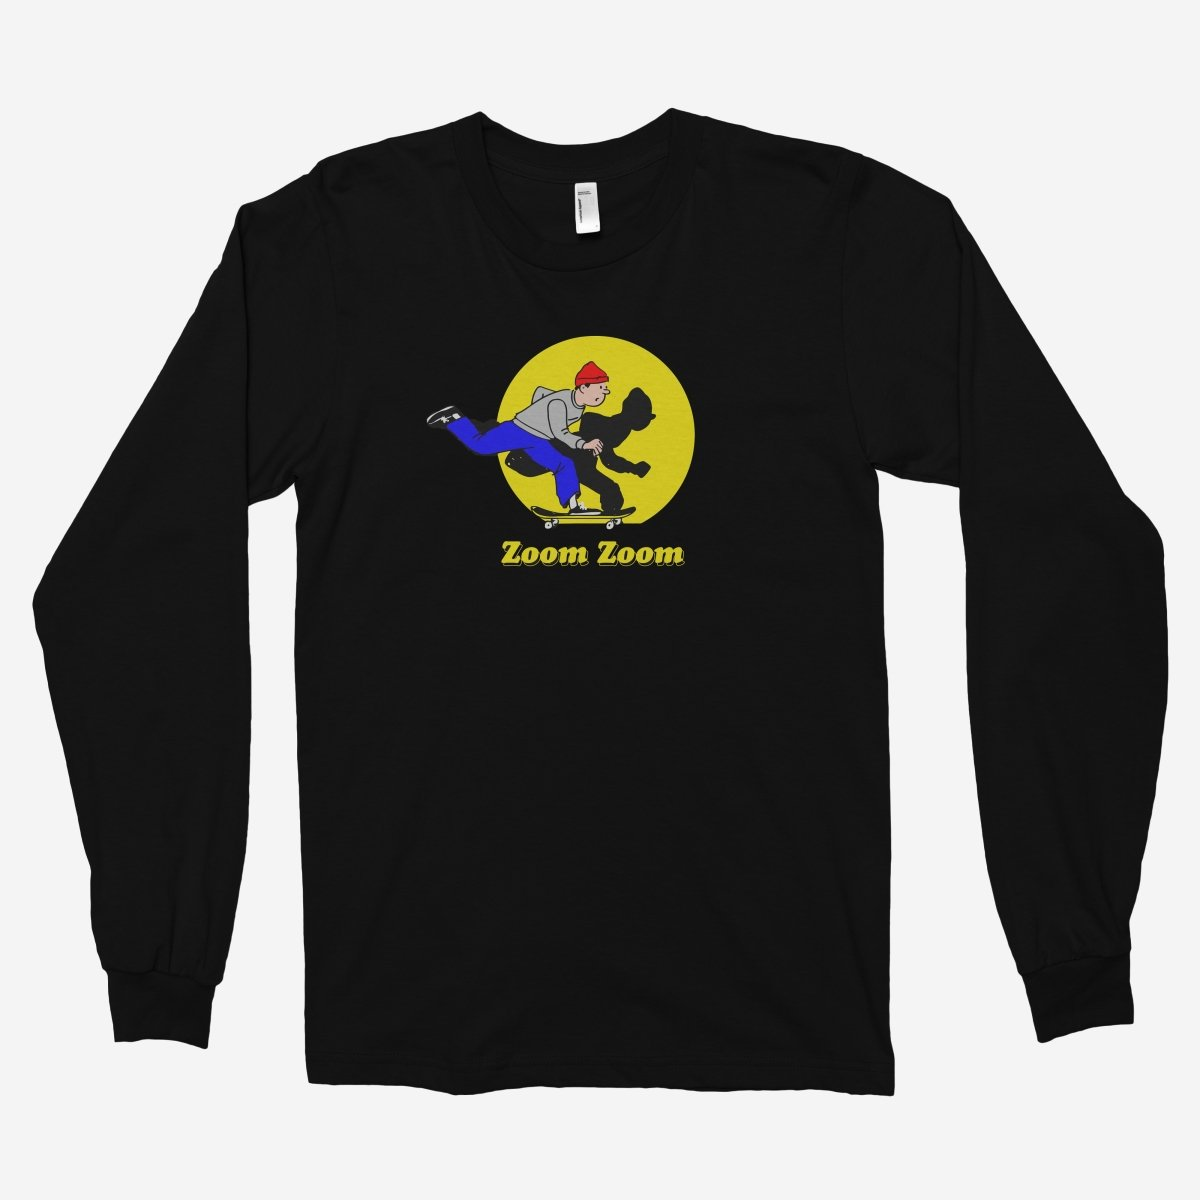 Zoom Zoom Unisex Long Sleeve T-Shirt